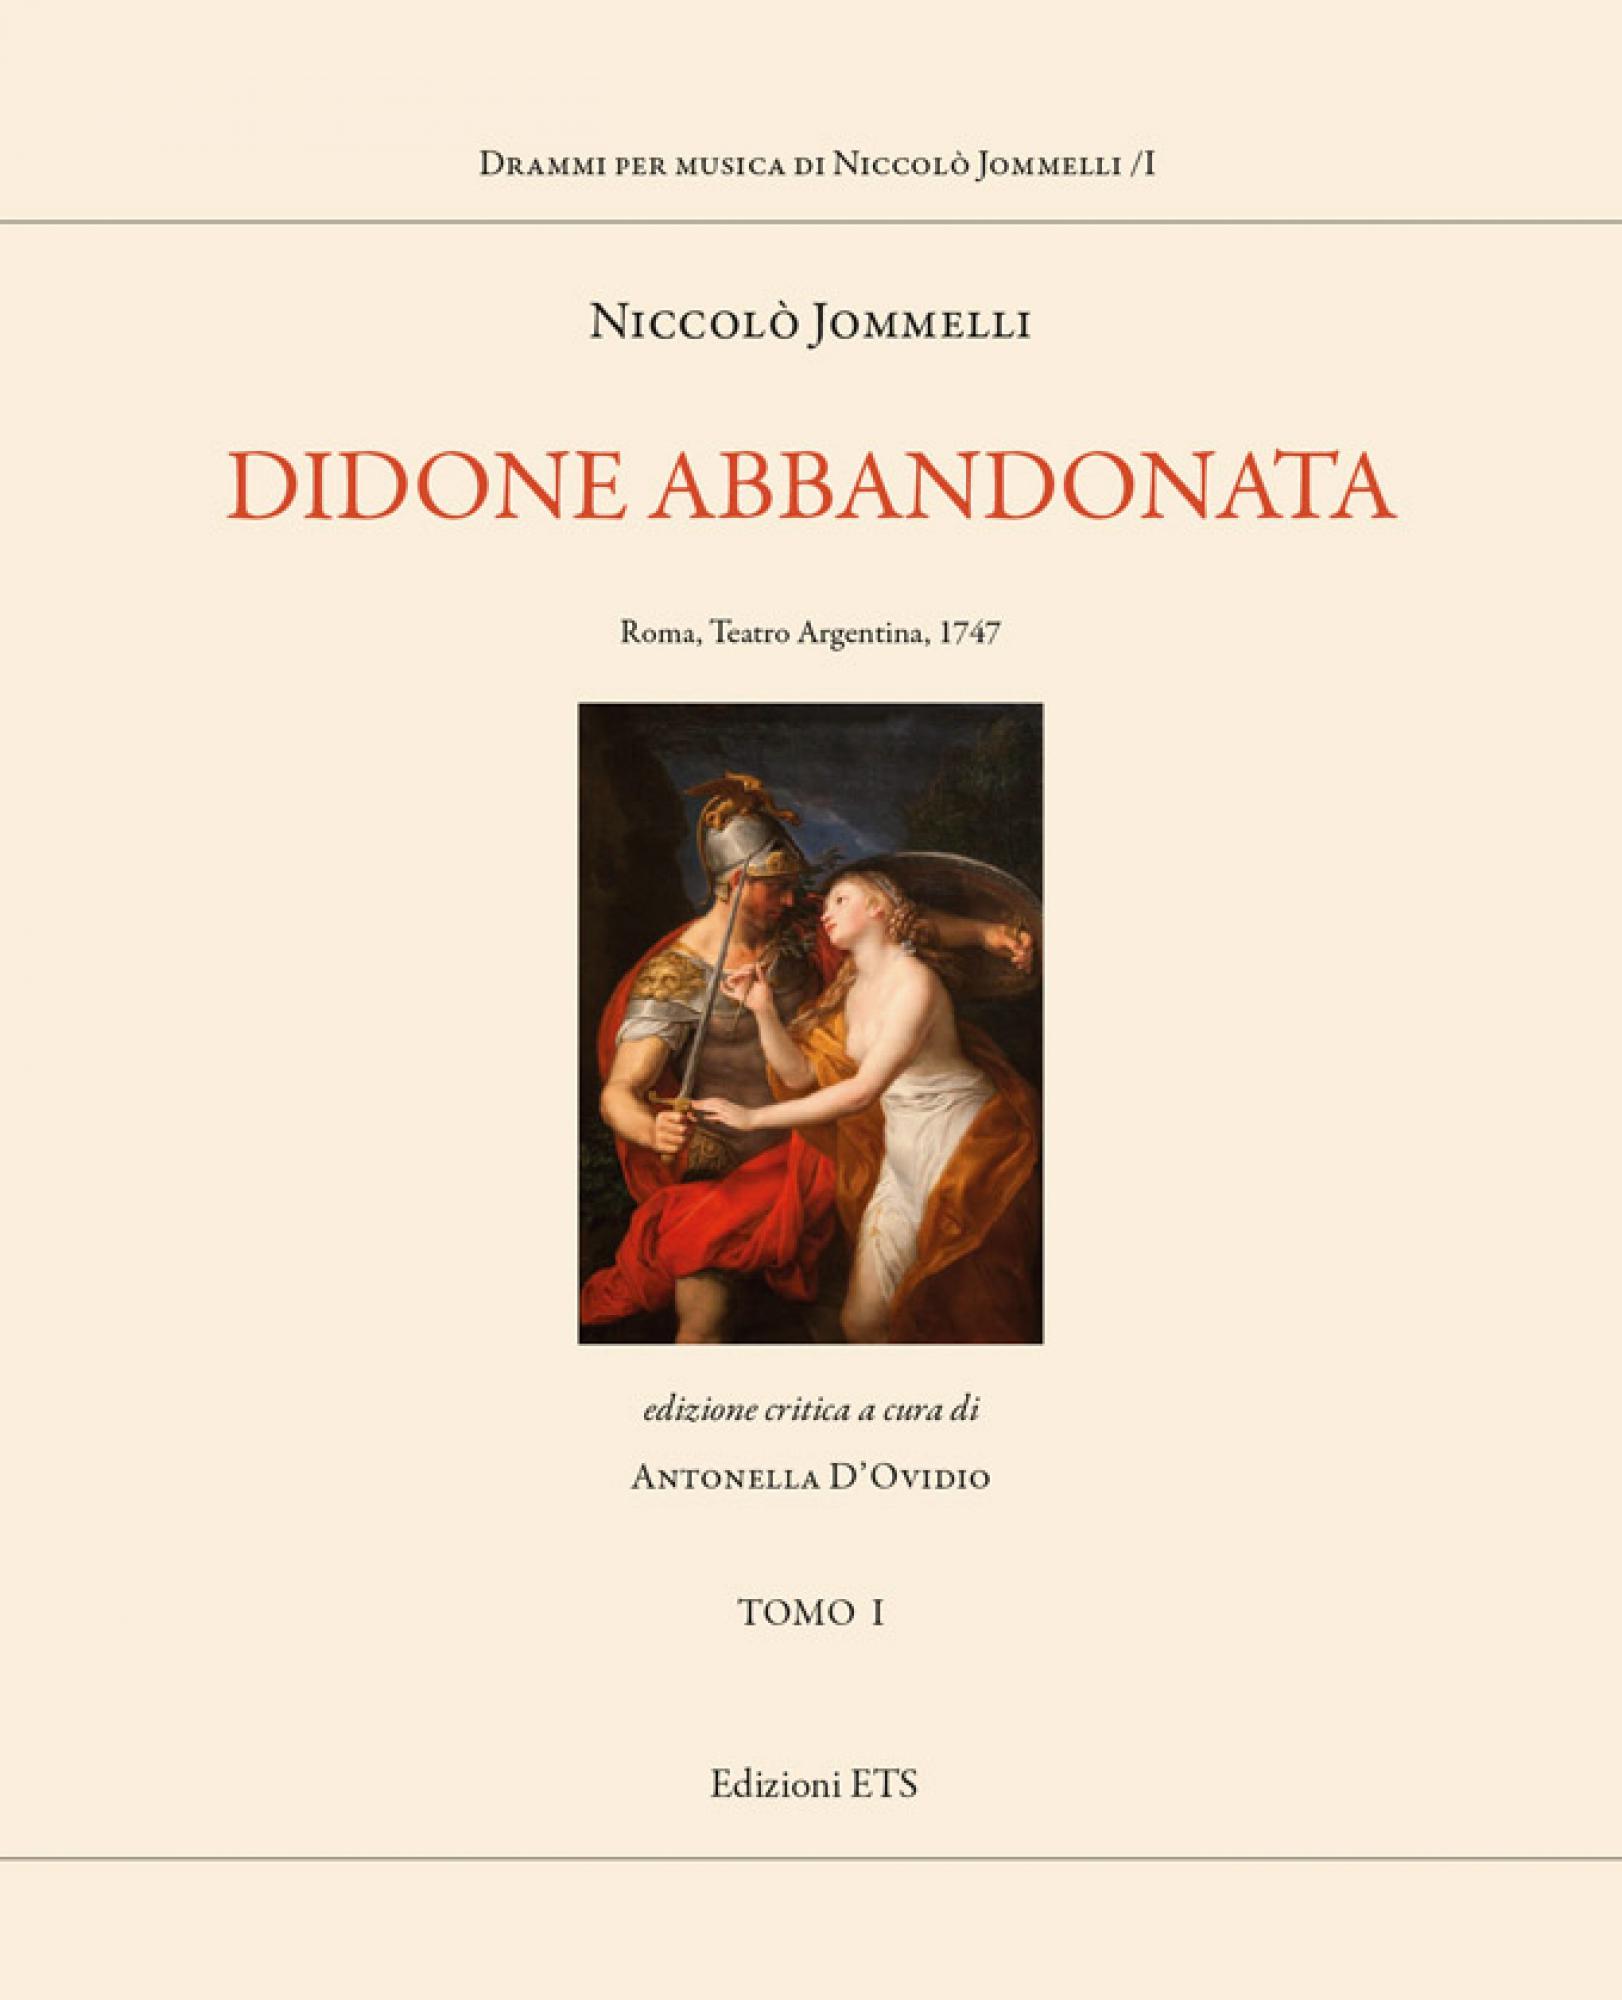 Didone abbandonata.Roma, Teatro Argentina, 1747